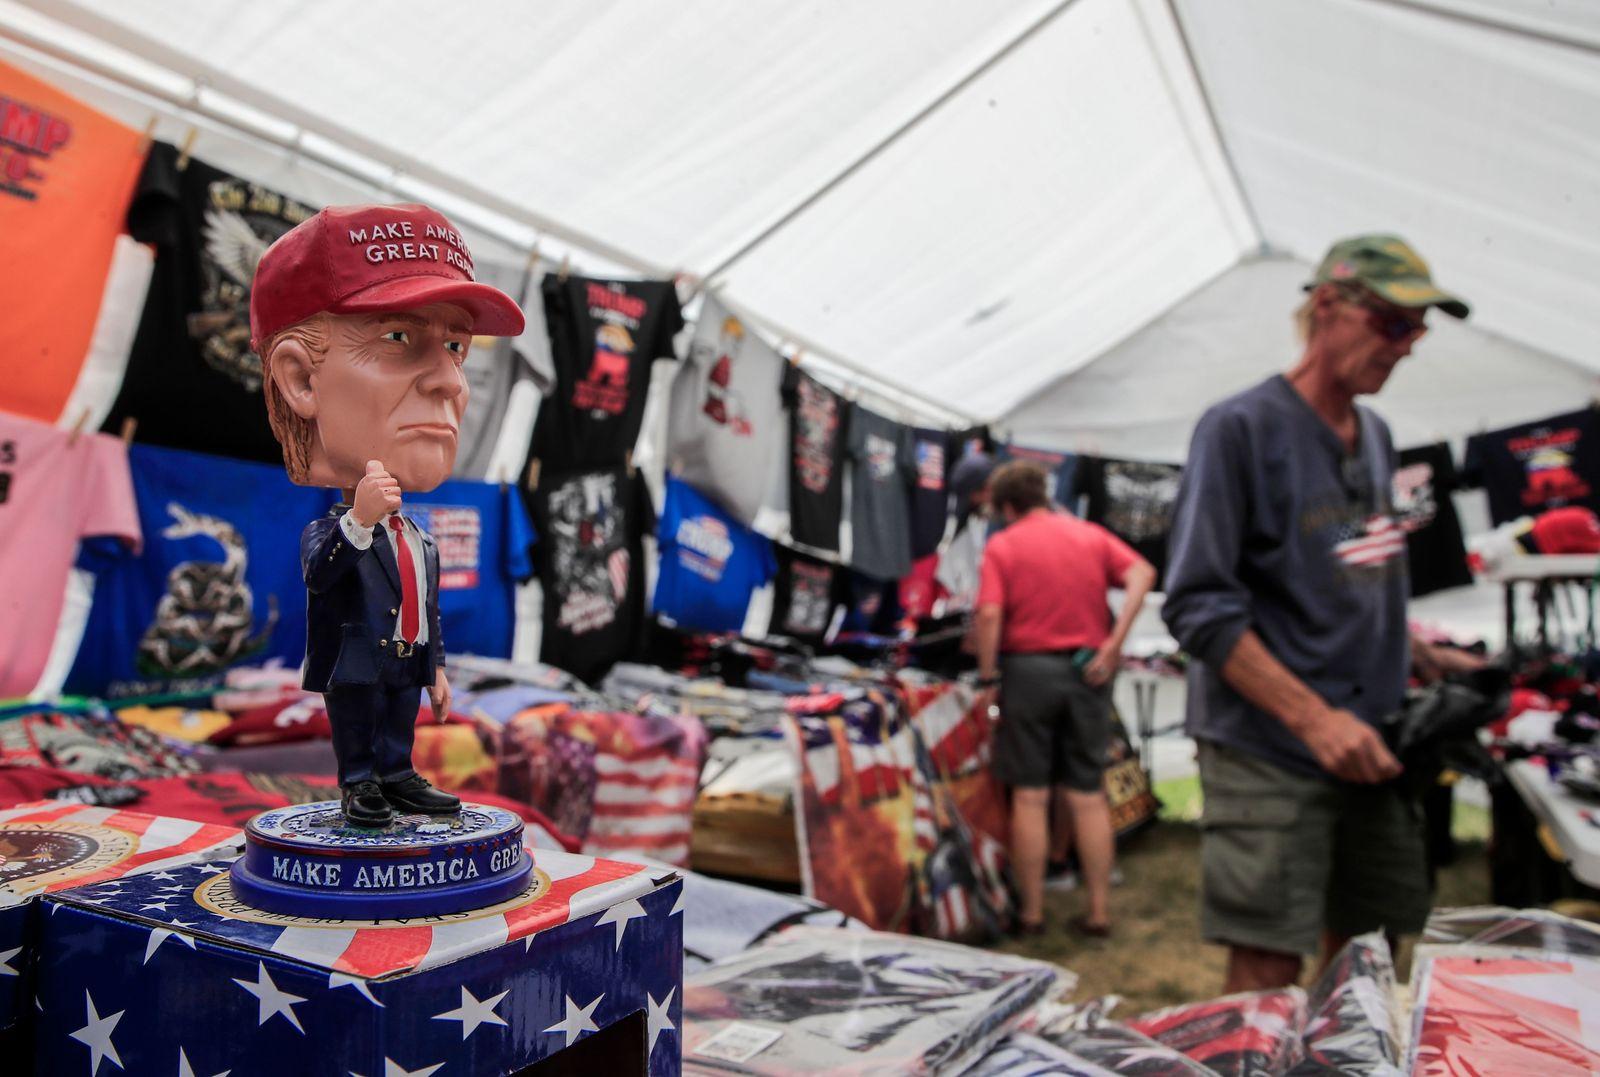 Visitors gather to Mount Rushmore before Trump's visit, Keystone, USA - 02 Jul 2020